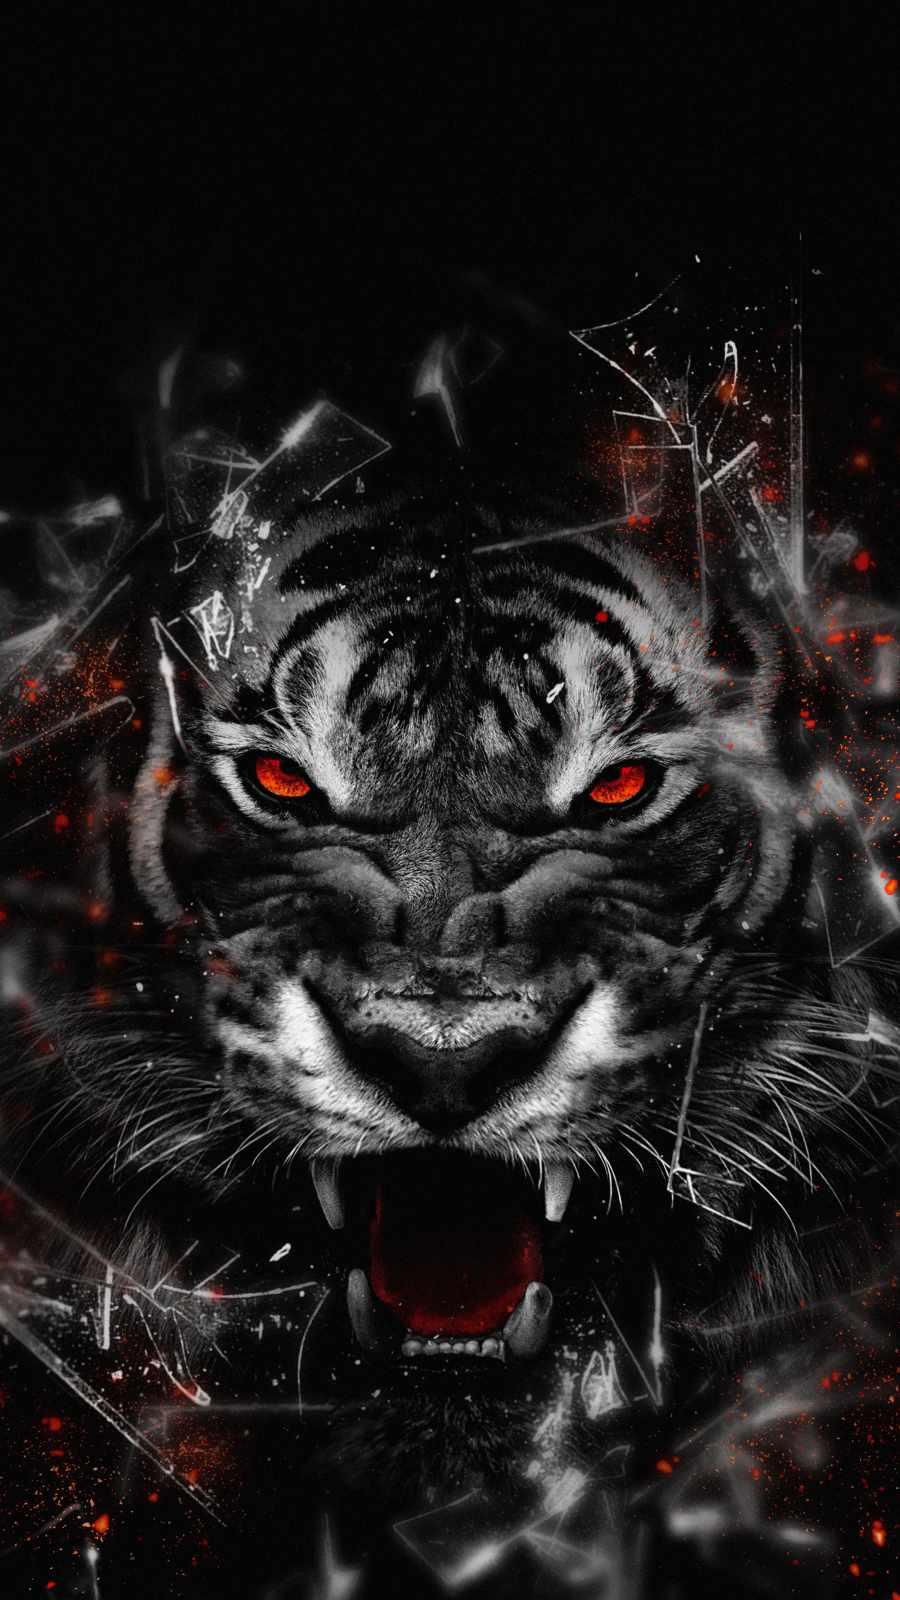 Tiger Attack iPhone Wallpaper